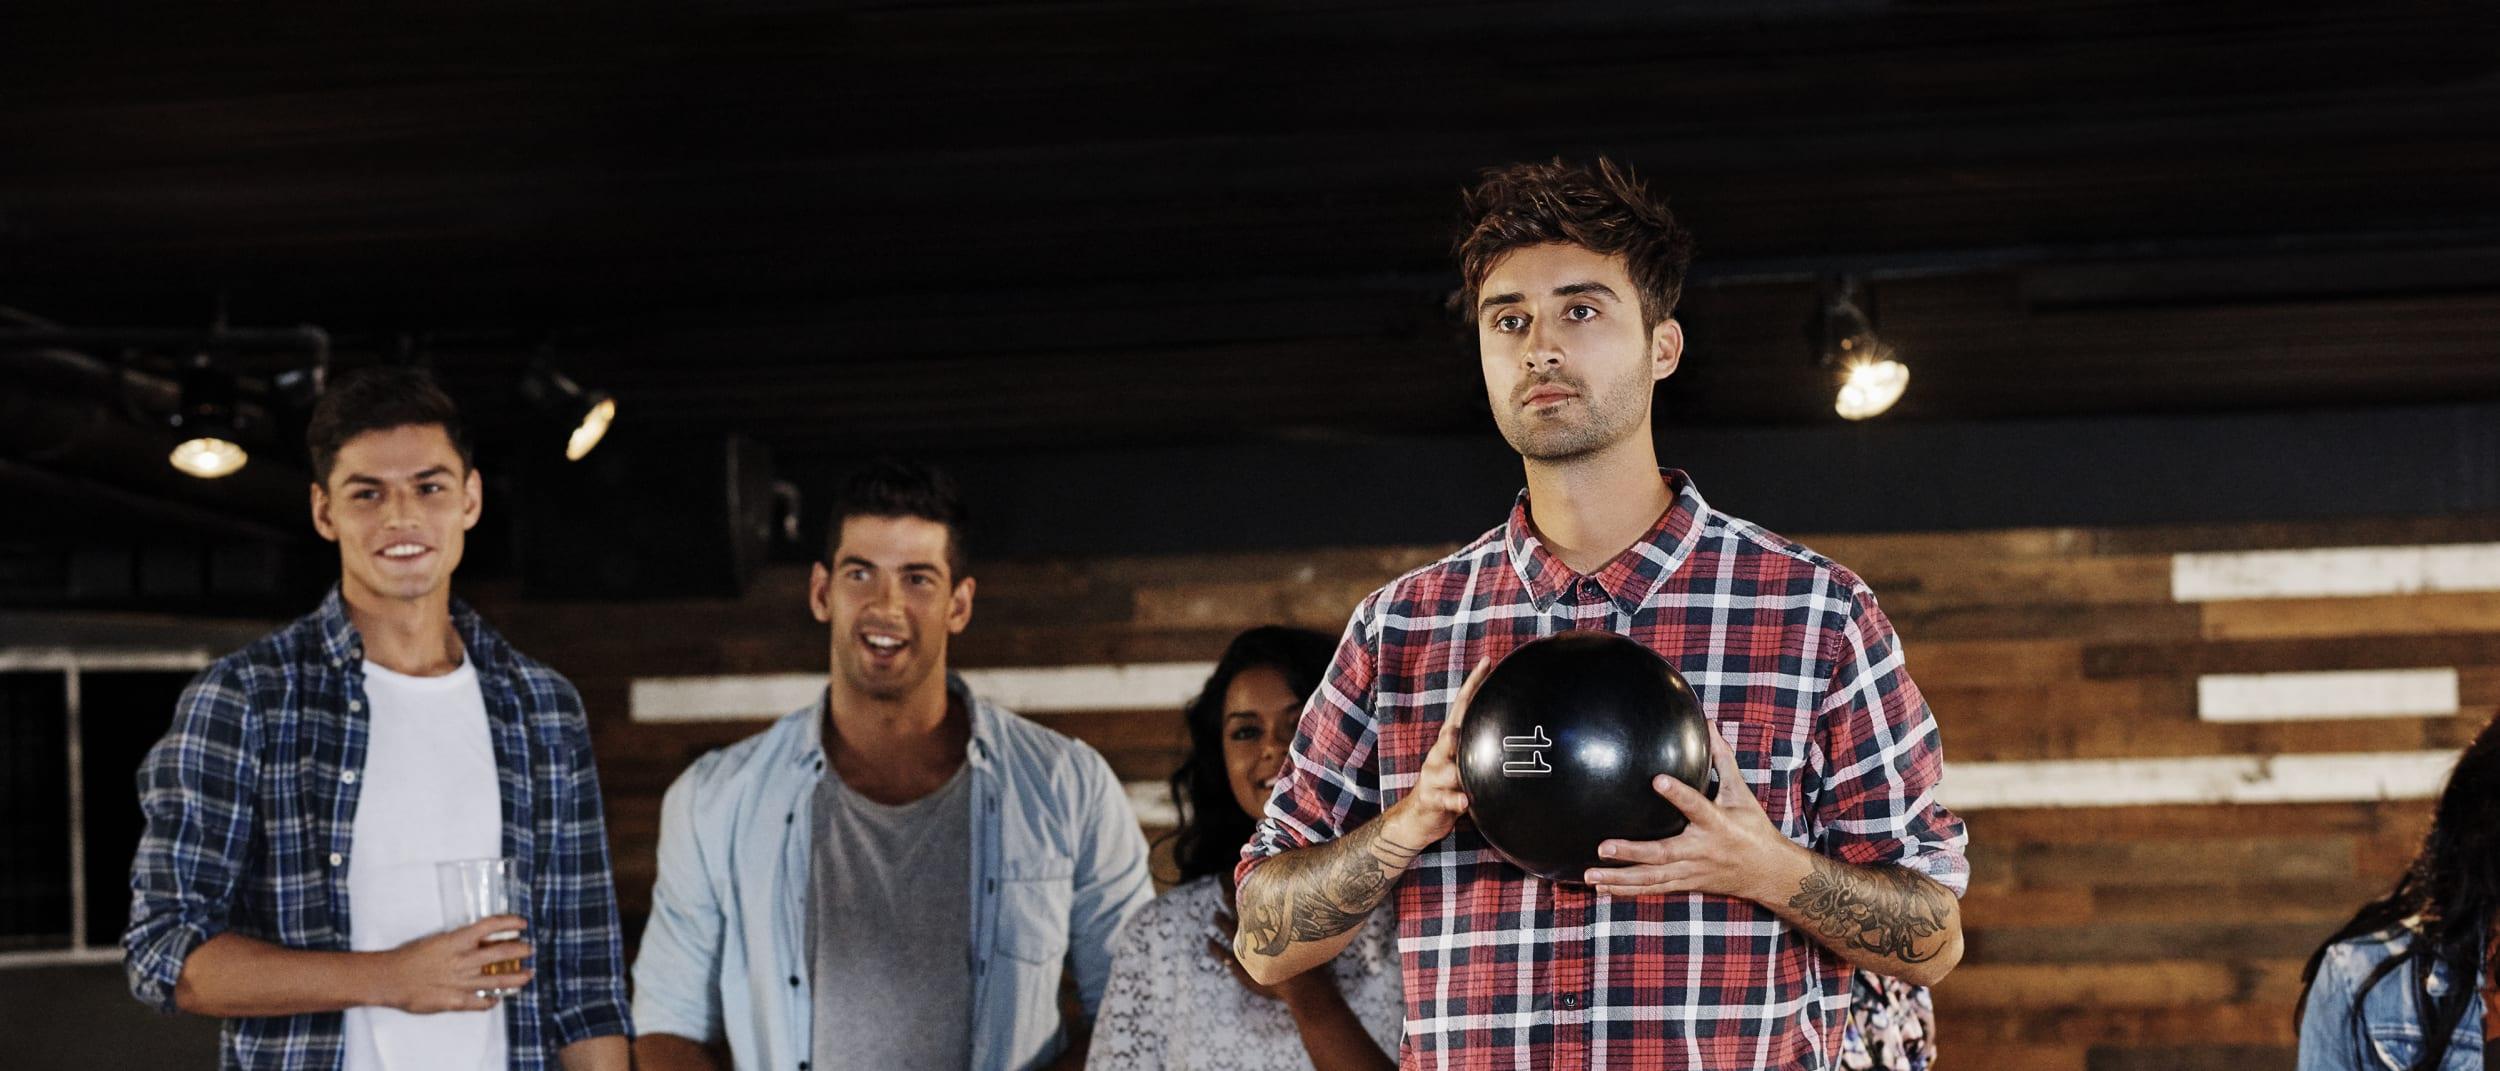 Strike Bowling: Funlab's day of fun